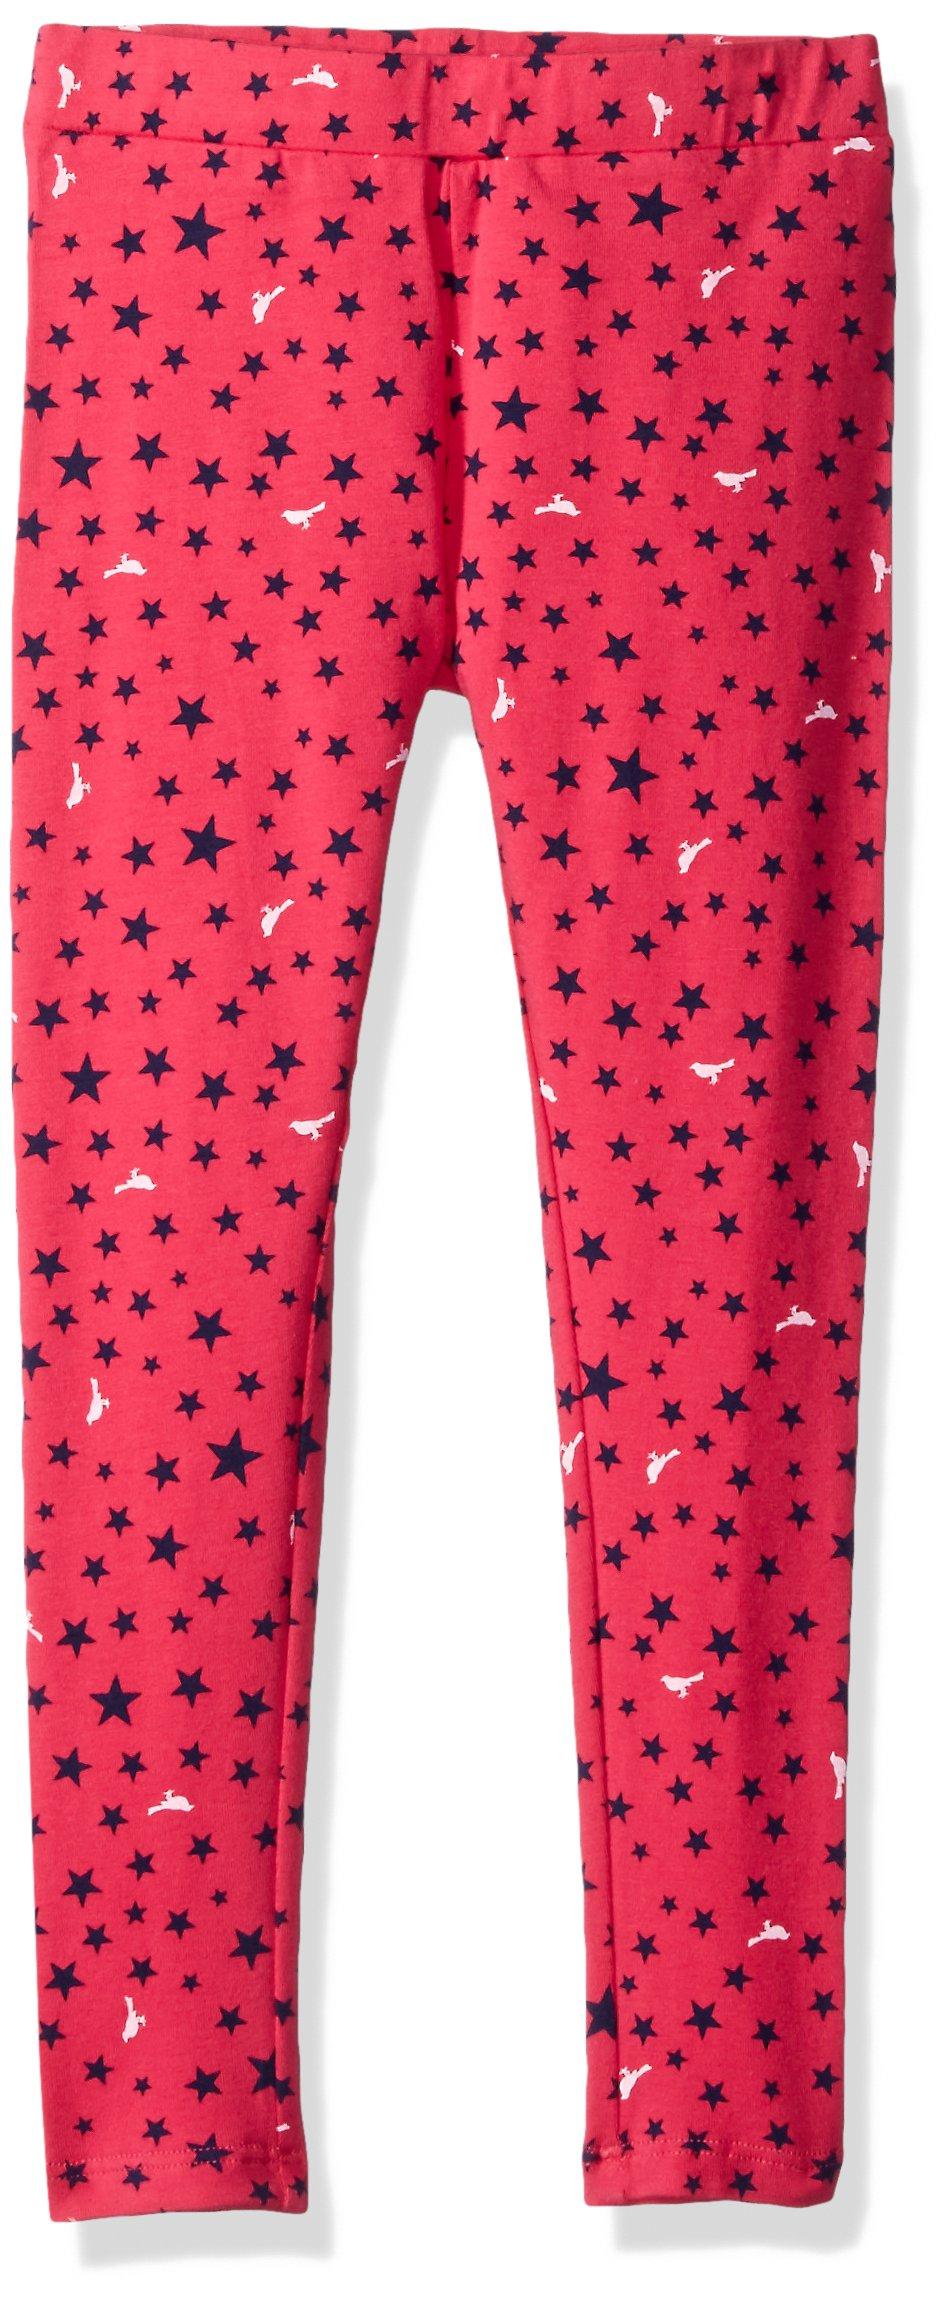 Scout + Ro Big Girls' Printed Star Jersey Legging, Lollipop, 7